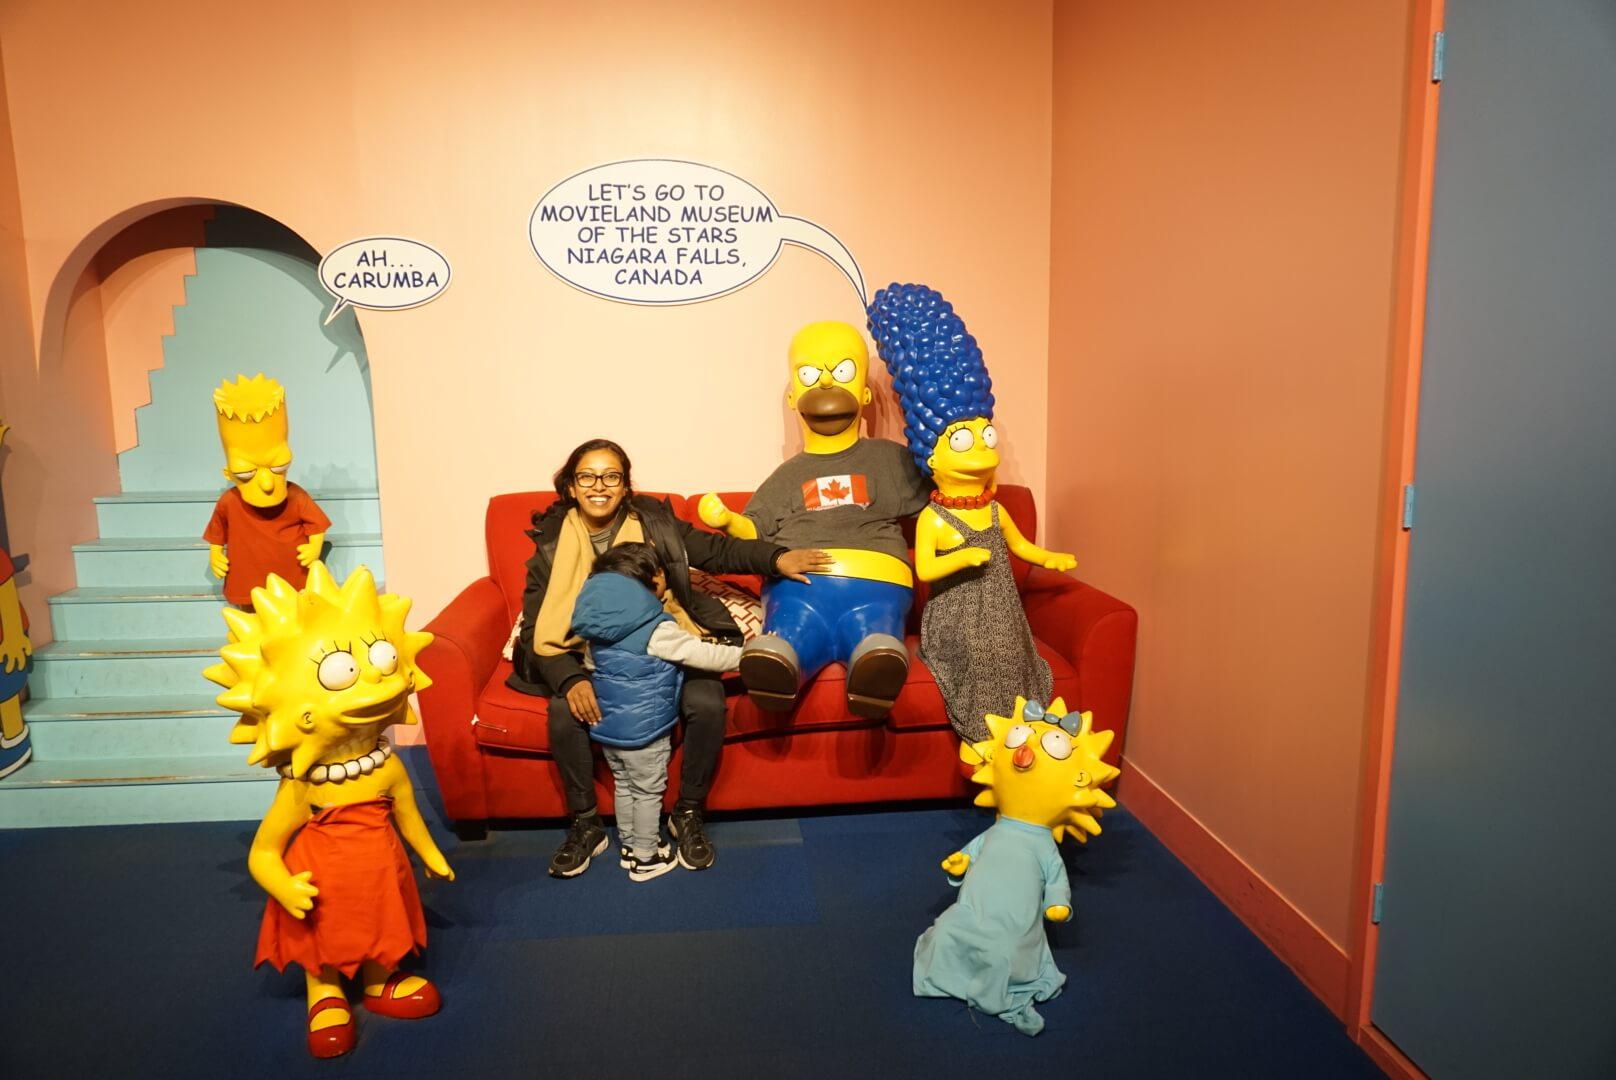 Family visiting movieland wax museum Niagara Falls.